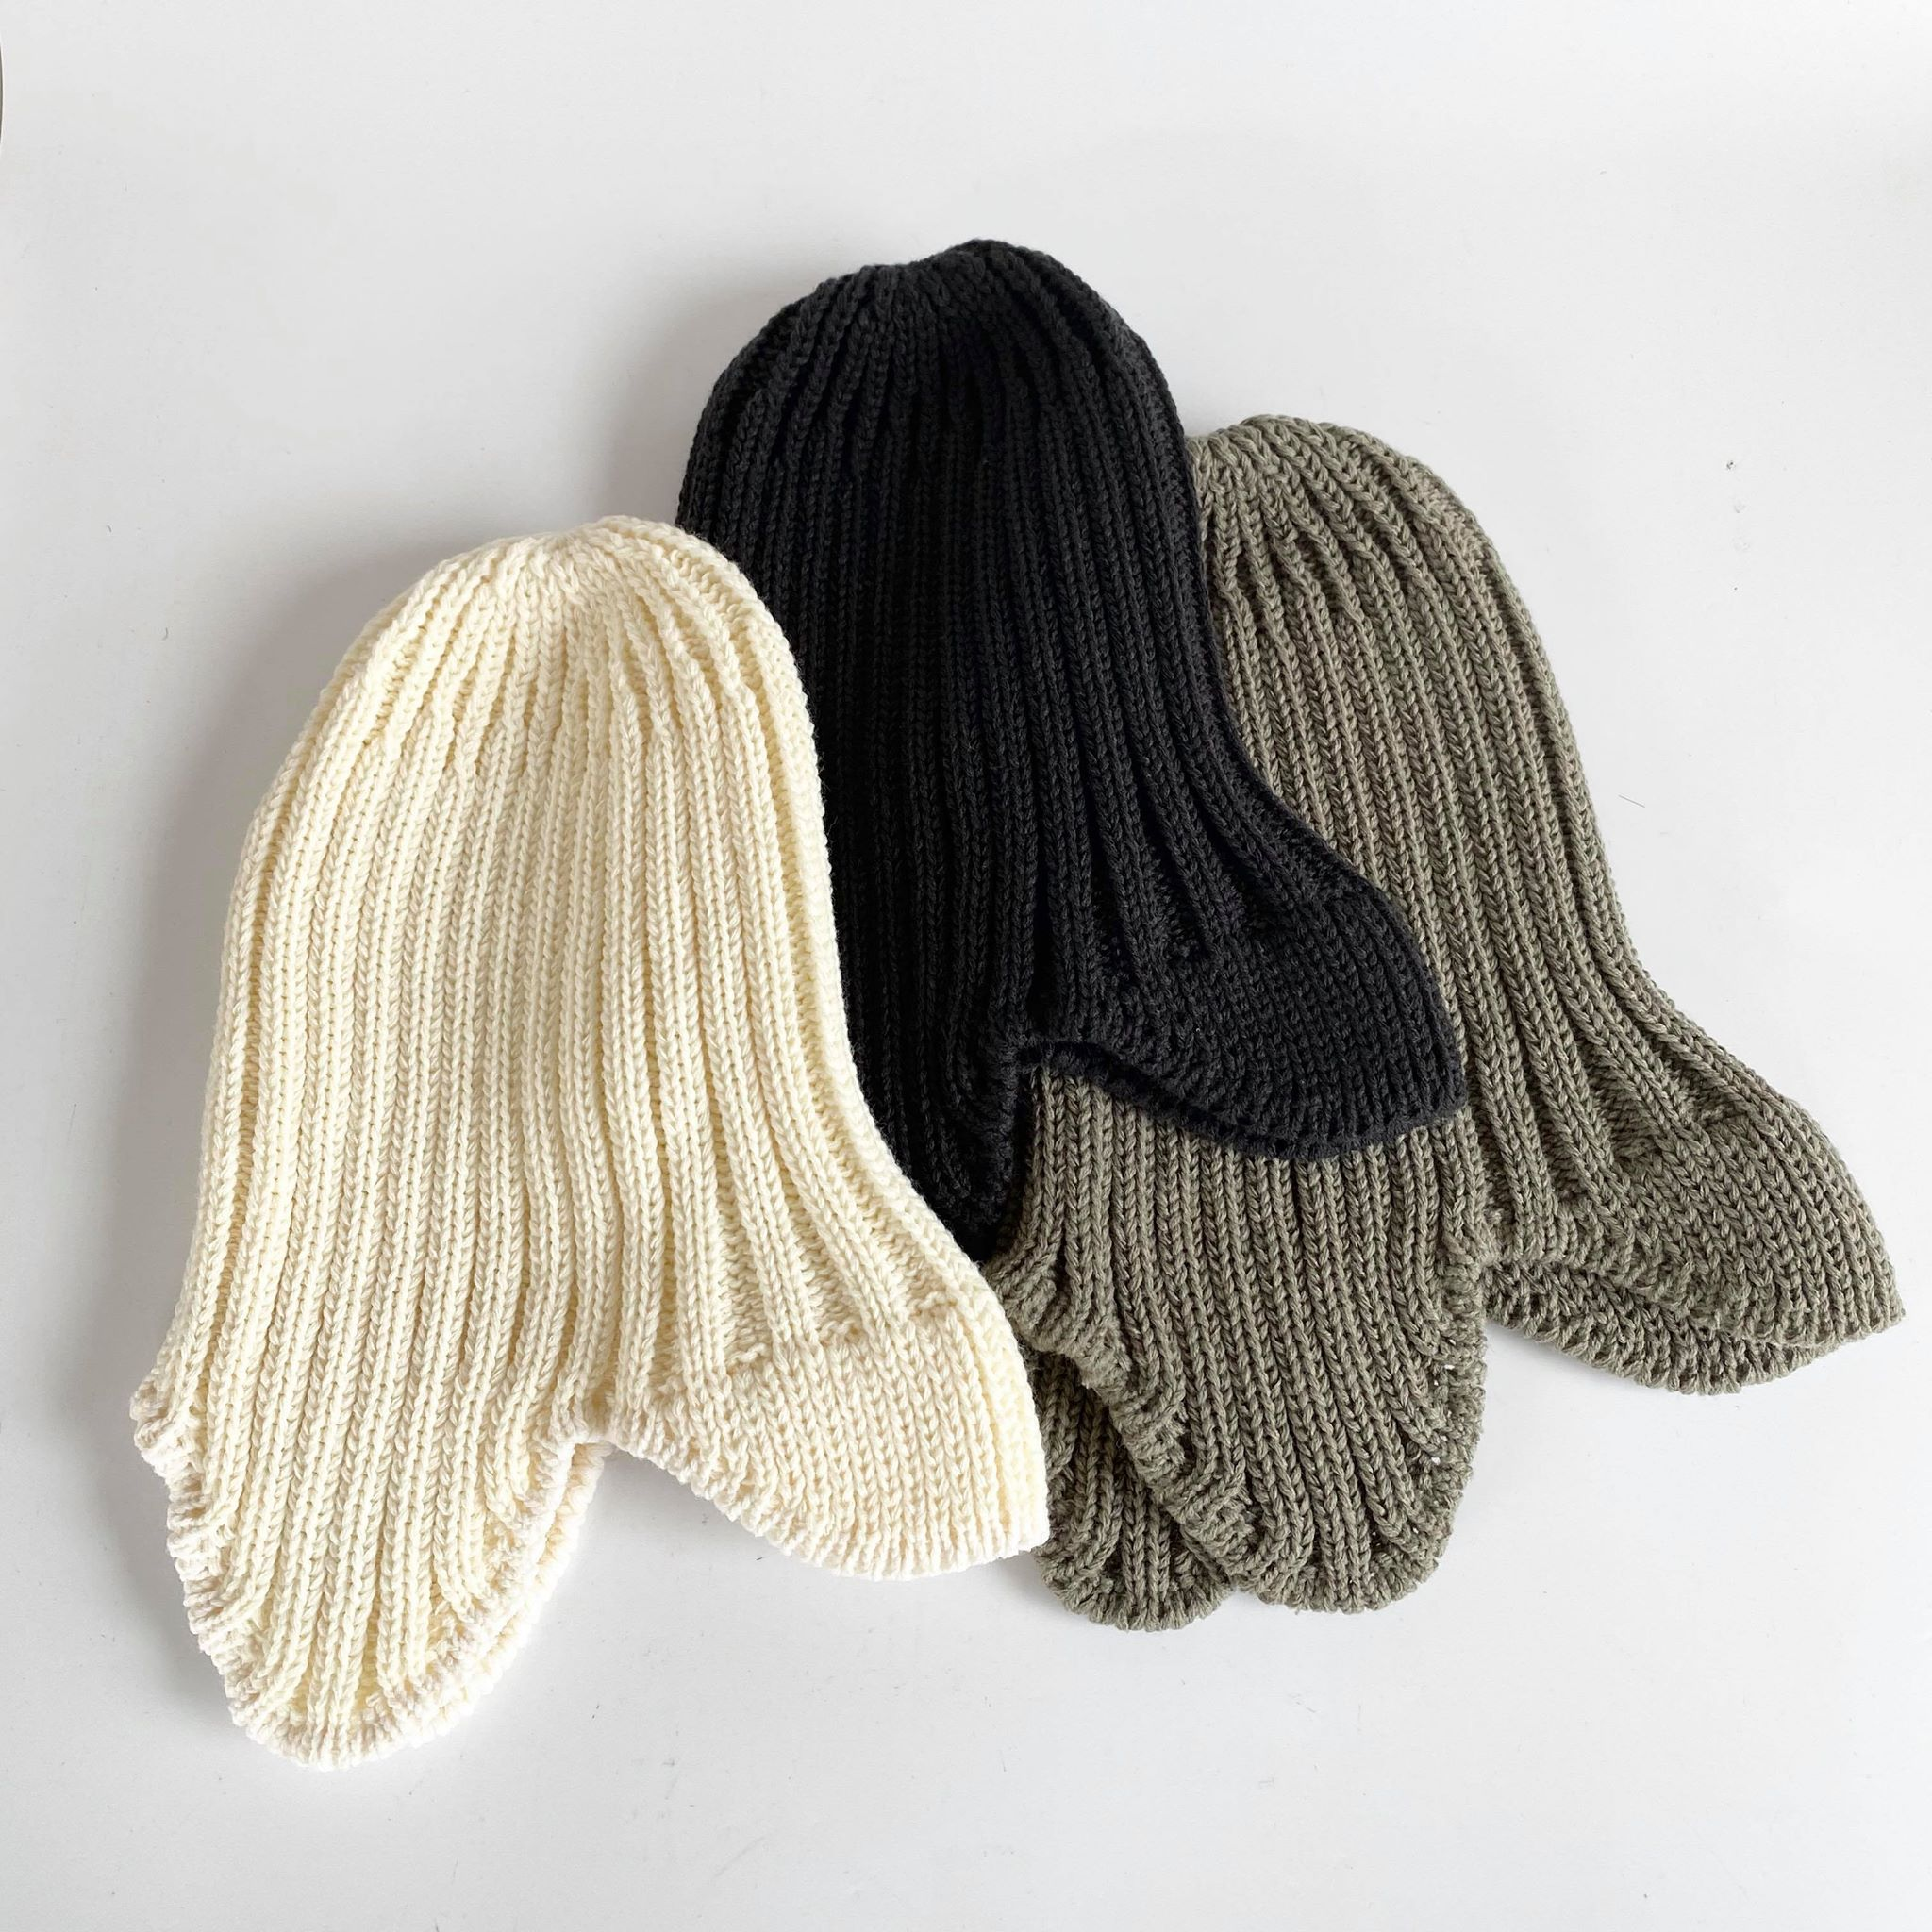 【MOUNTEN.】MT202019 knit flight cap